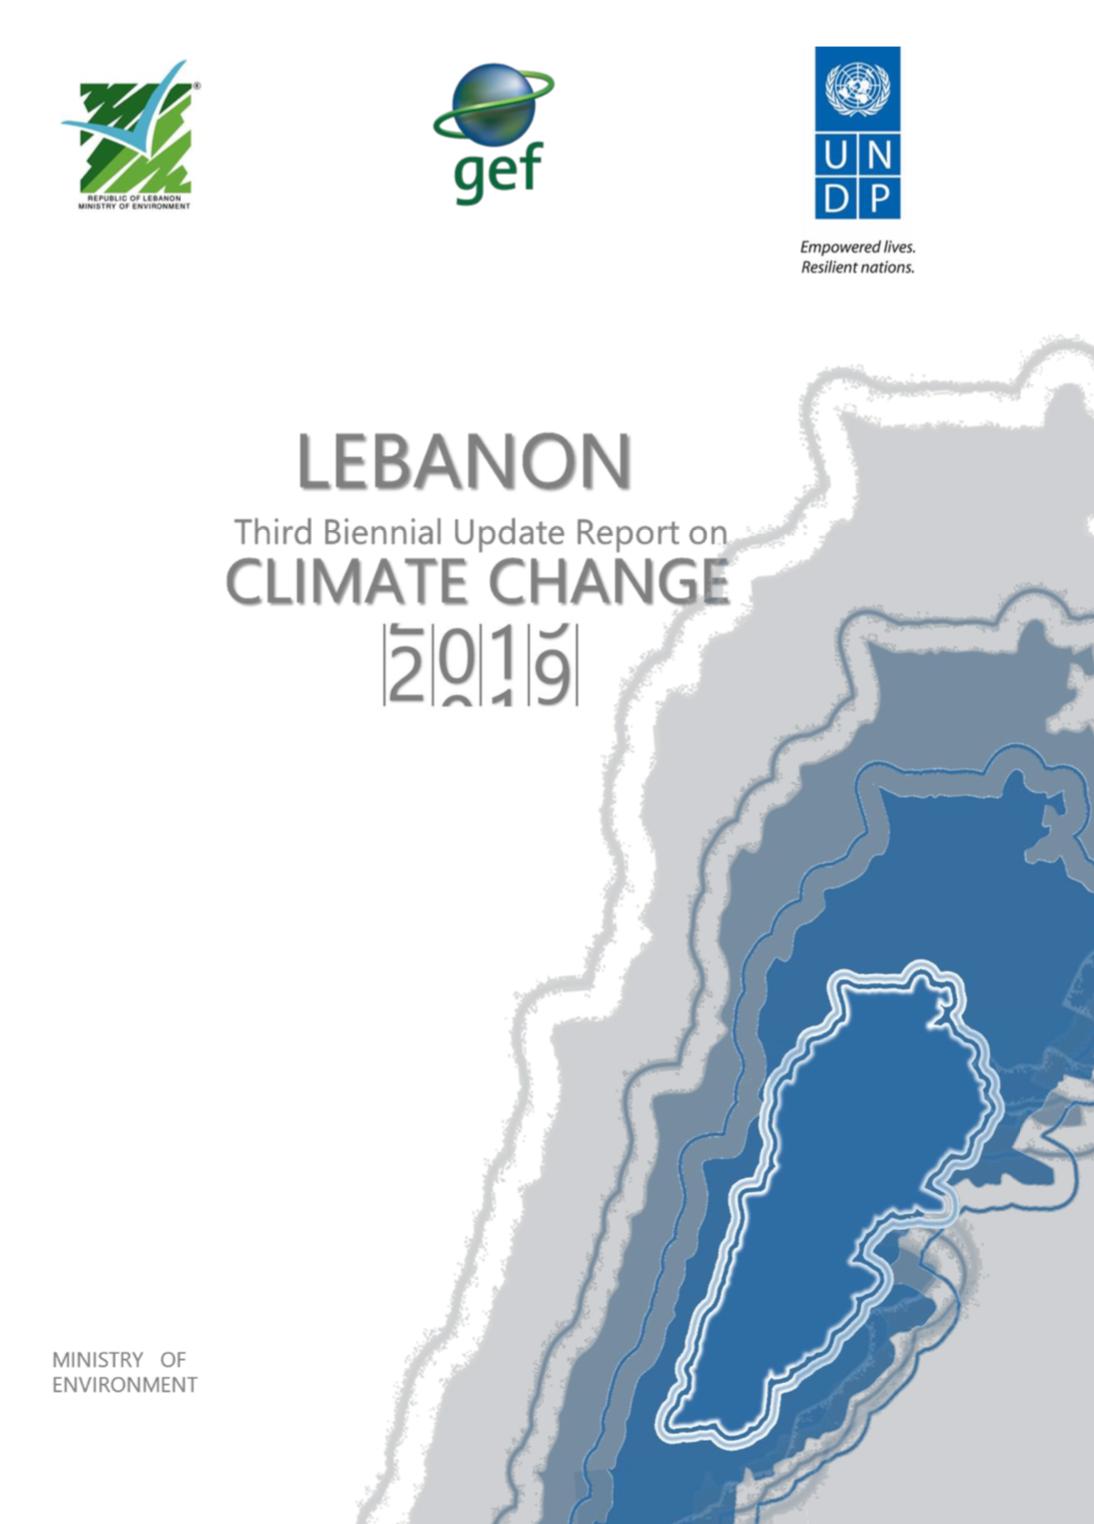 Lebanon's Third Biennial Update Report (BUR) to the UNFCCC